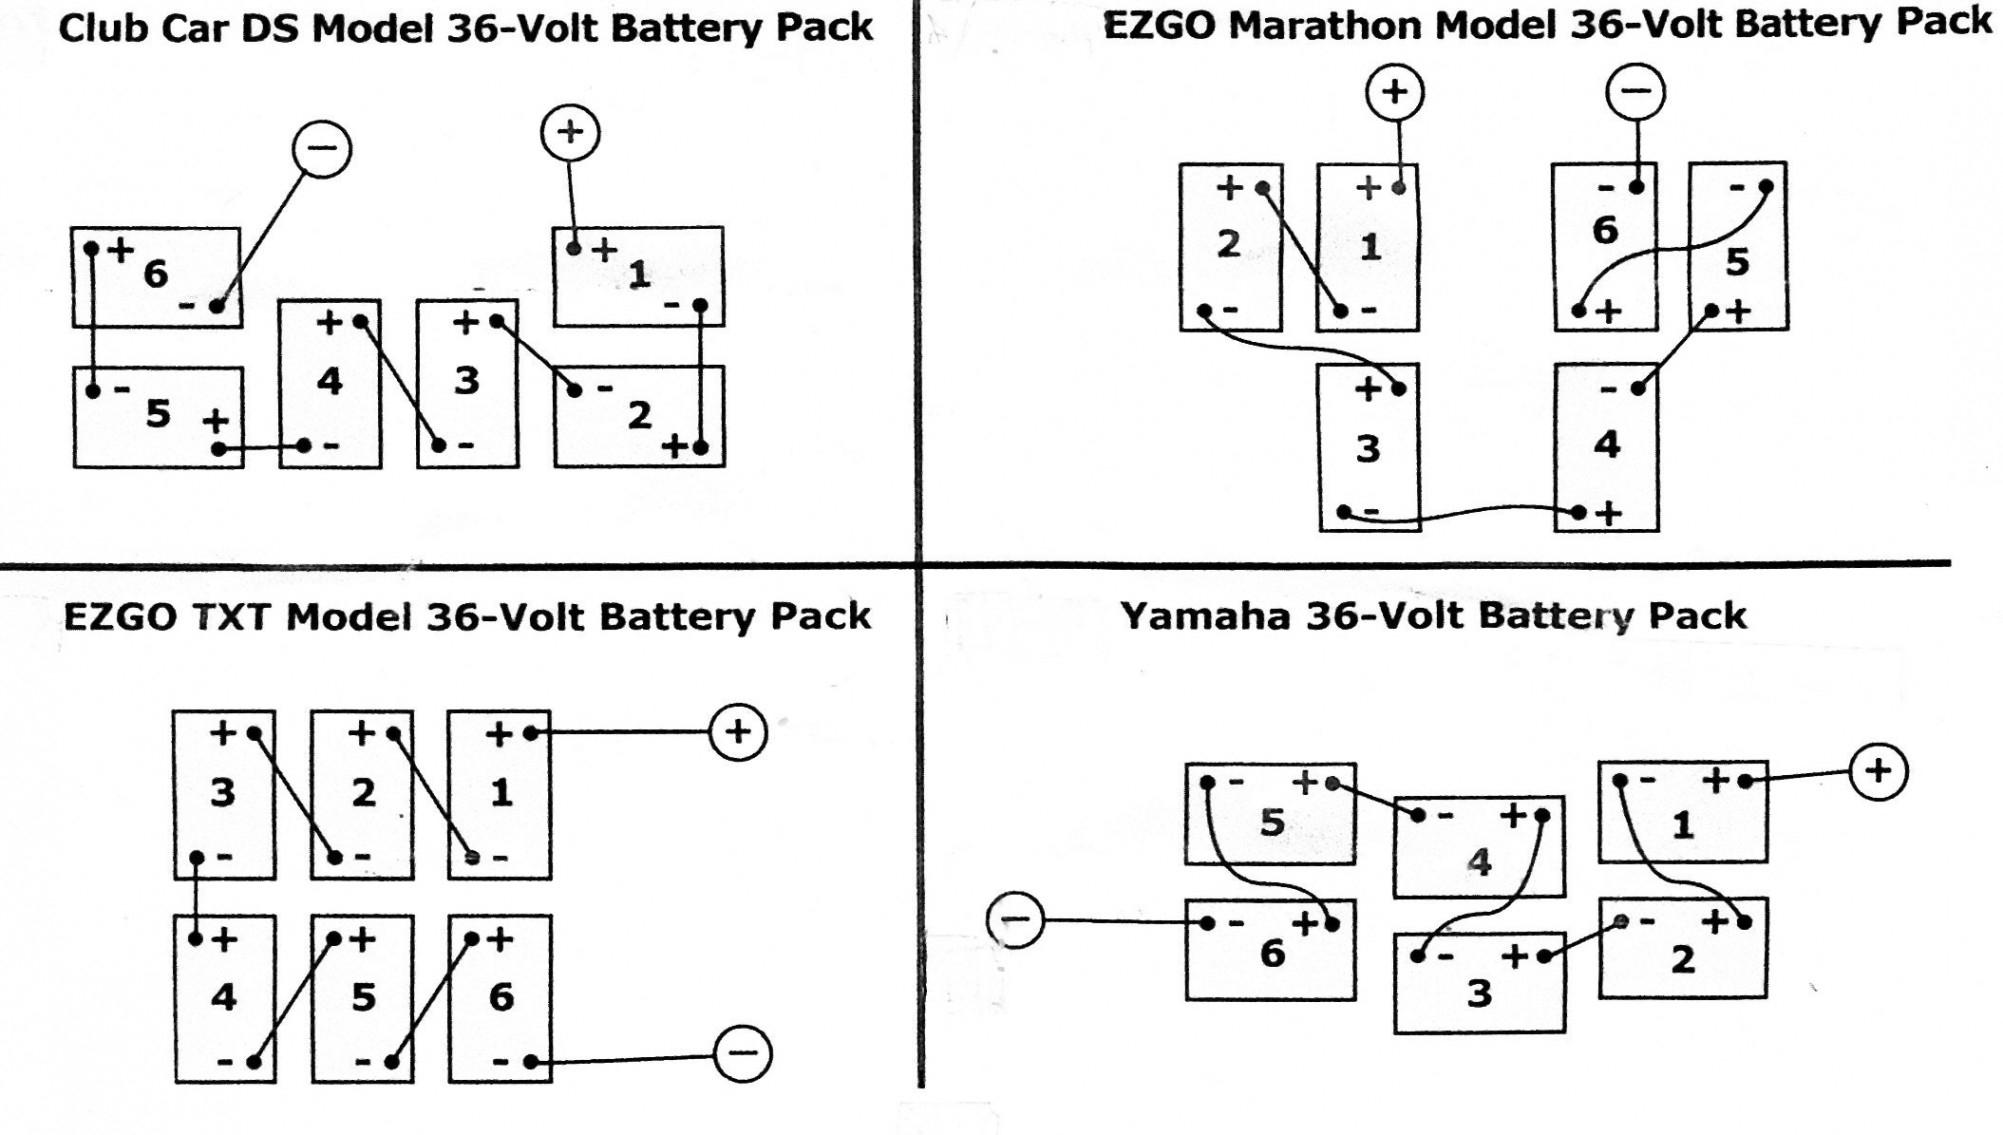 36 volt club car golf cart wiring diagram Download-Club Car Wiring Diagram 36 Volt – Wiring Diagrams For Yamaha Golf Carts Refrence Ez Golf 4-l